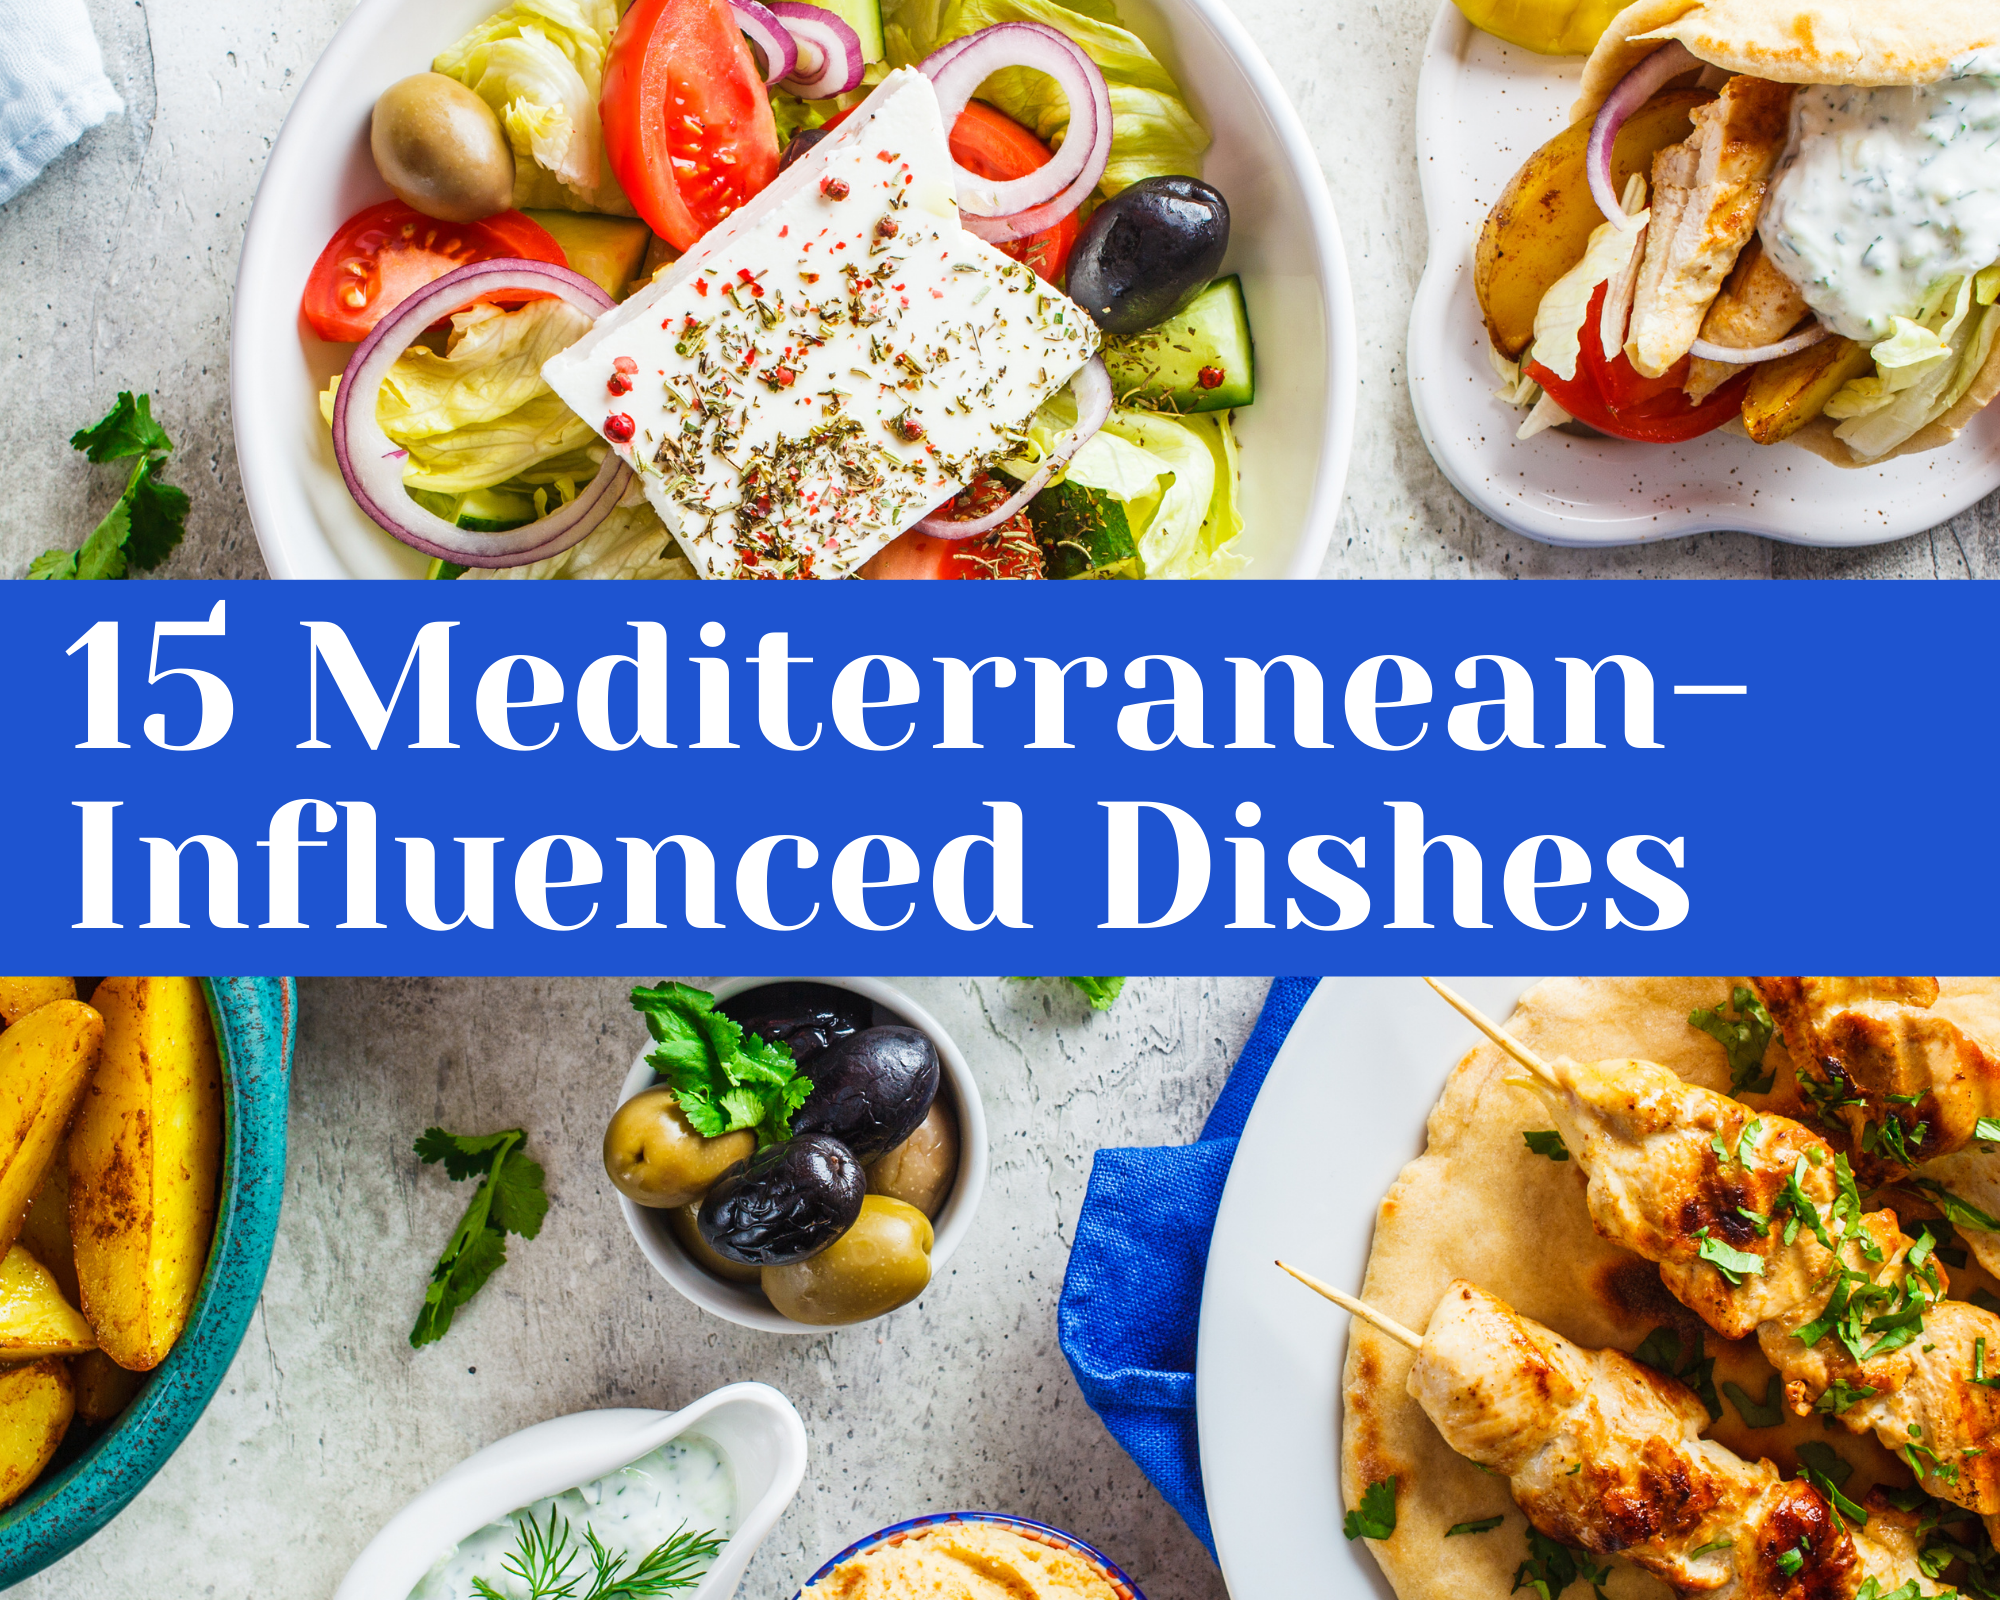 Mediterranean-Influenced Dishes